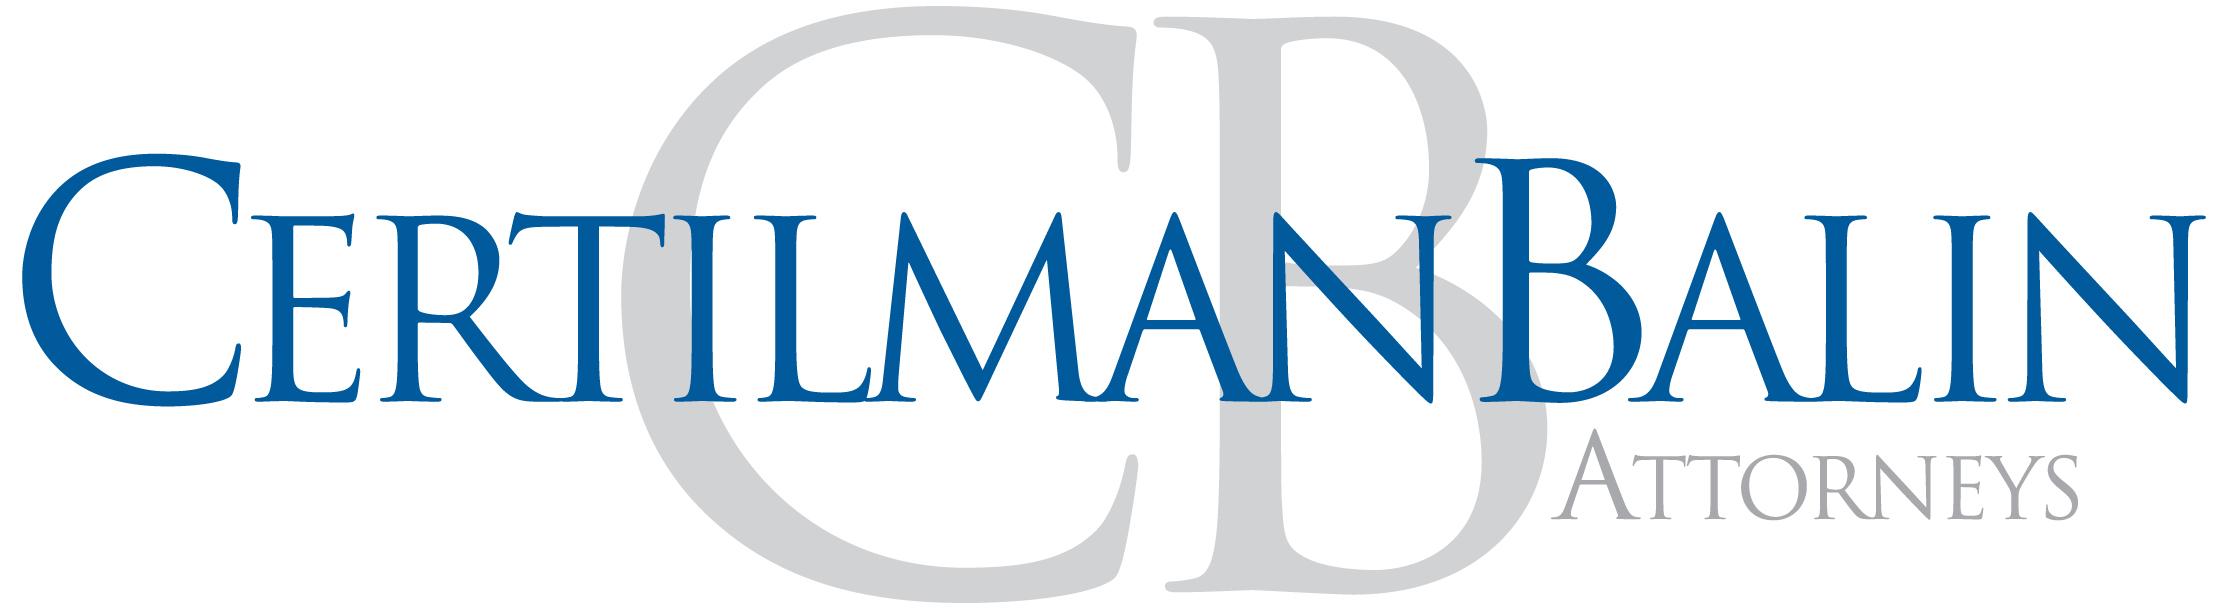 Certilman Balin Logo.jpg